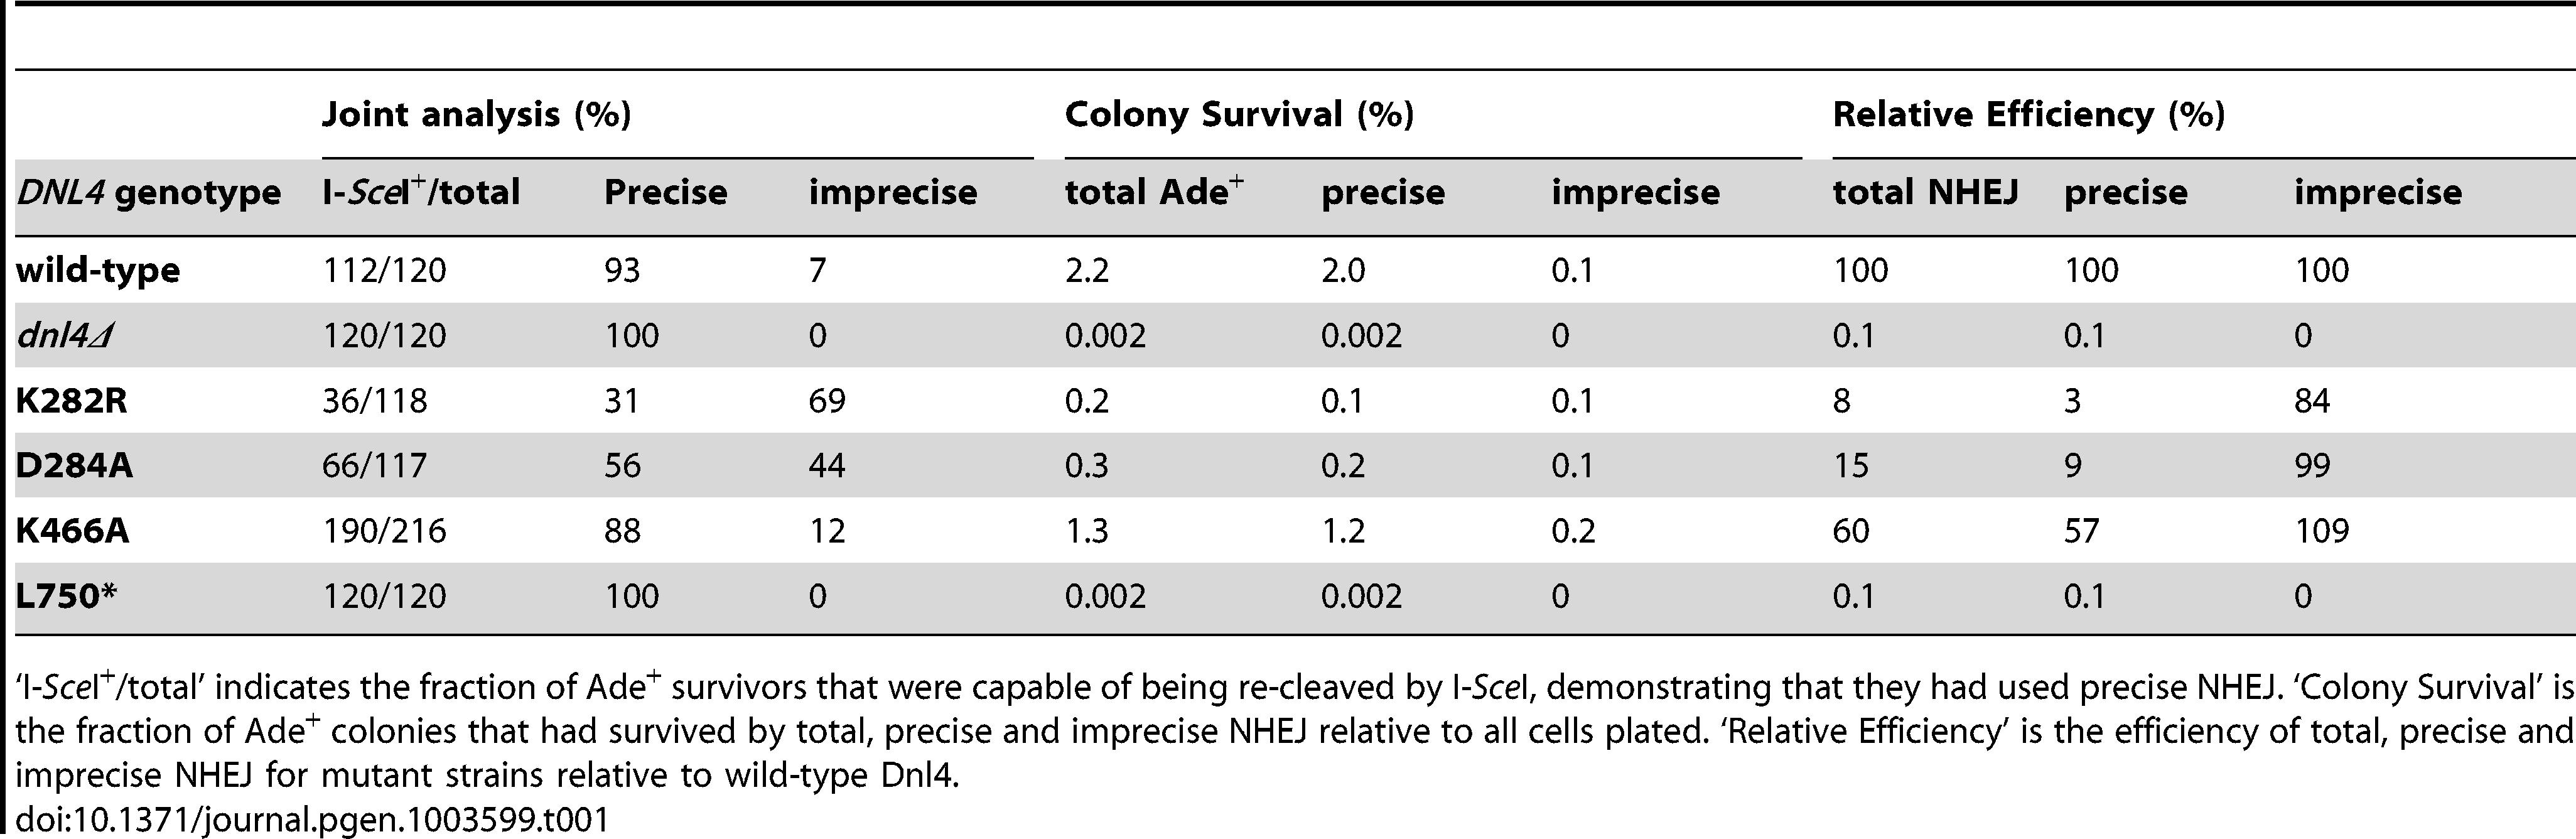 NHEJ precision in Ade<sup>+</sup> suicide deletion colonies.